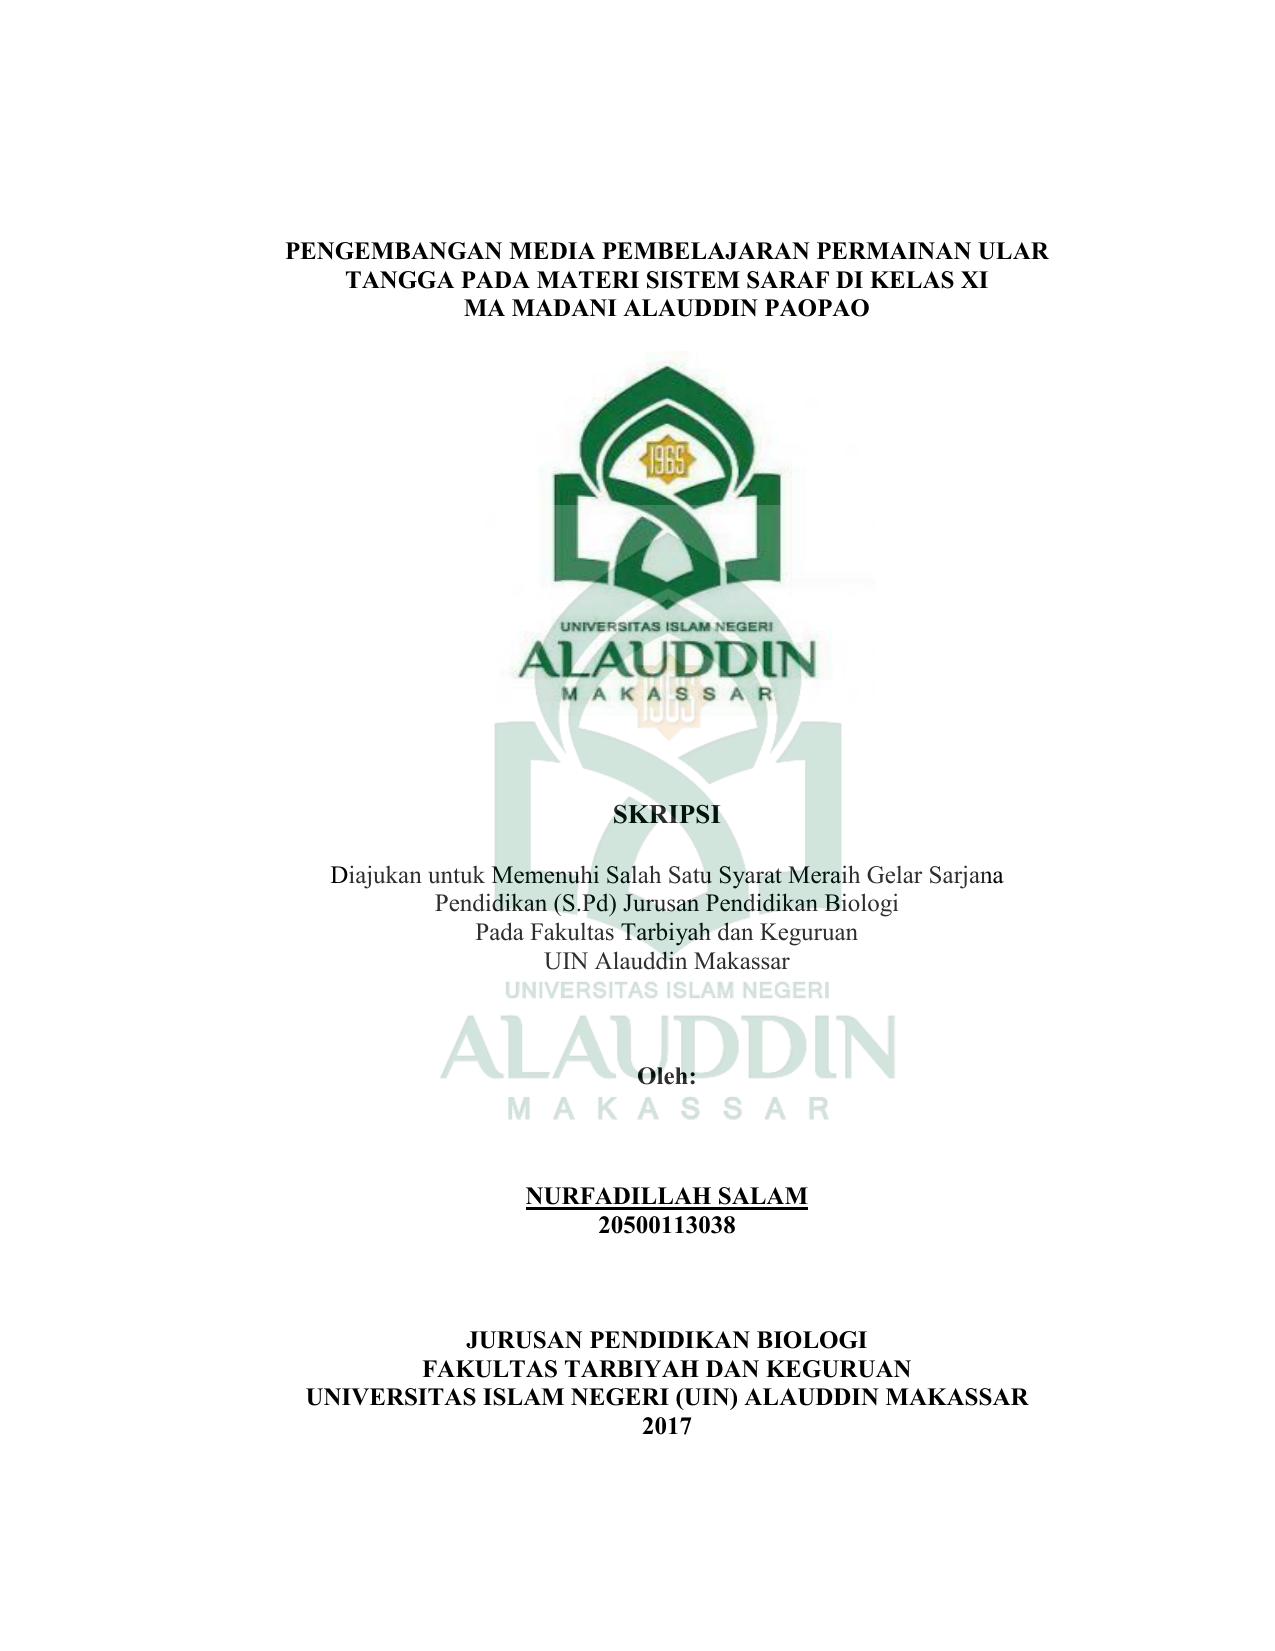 Skripsi Repositori Uin Alauddin Makassar